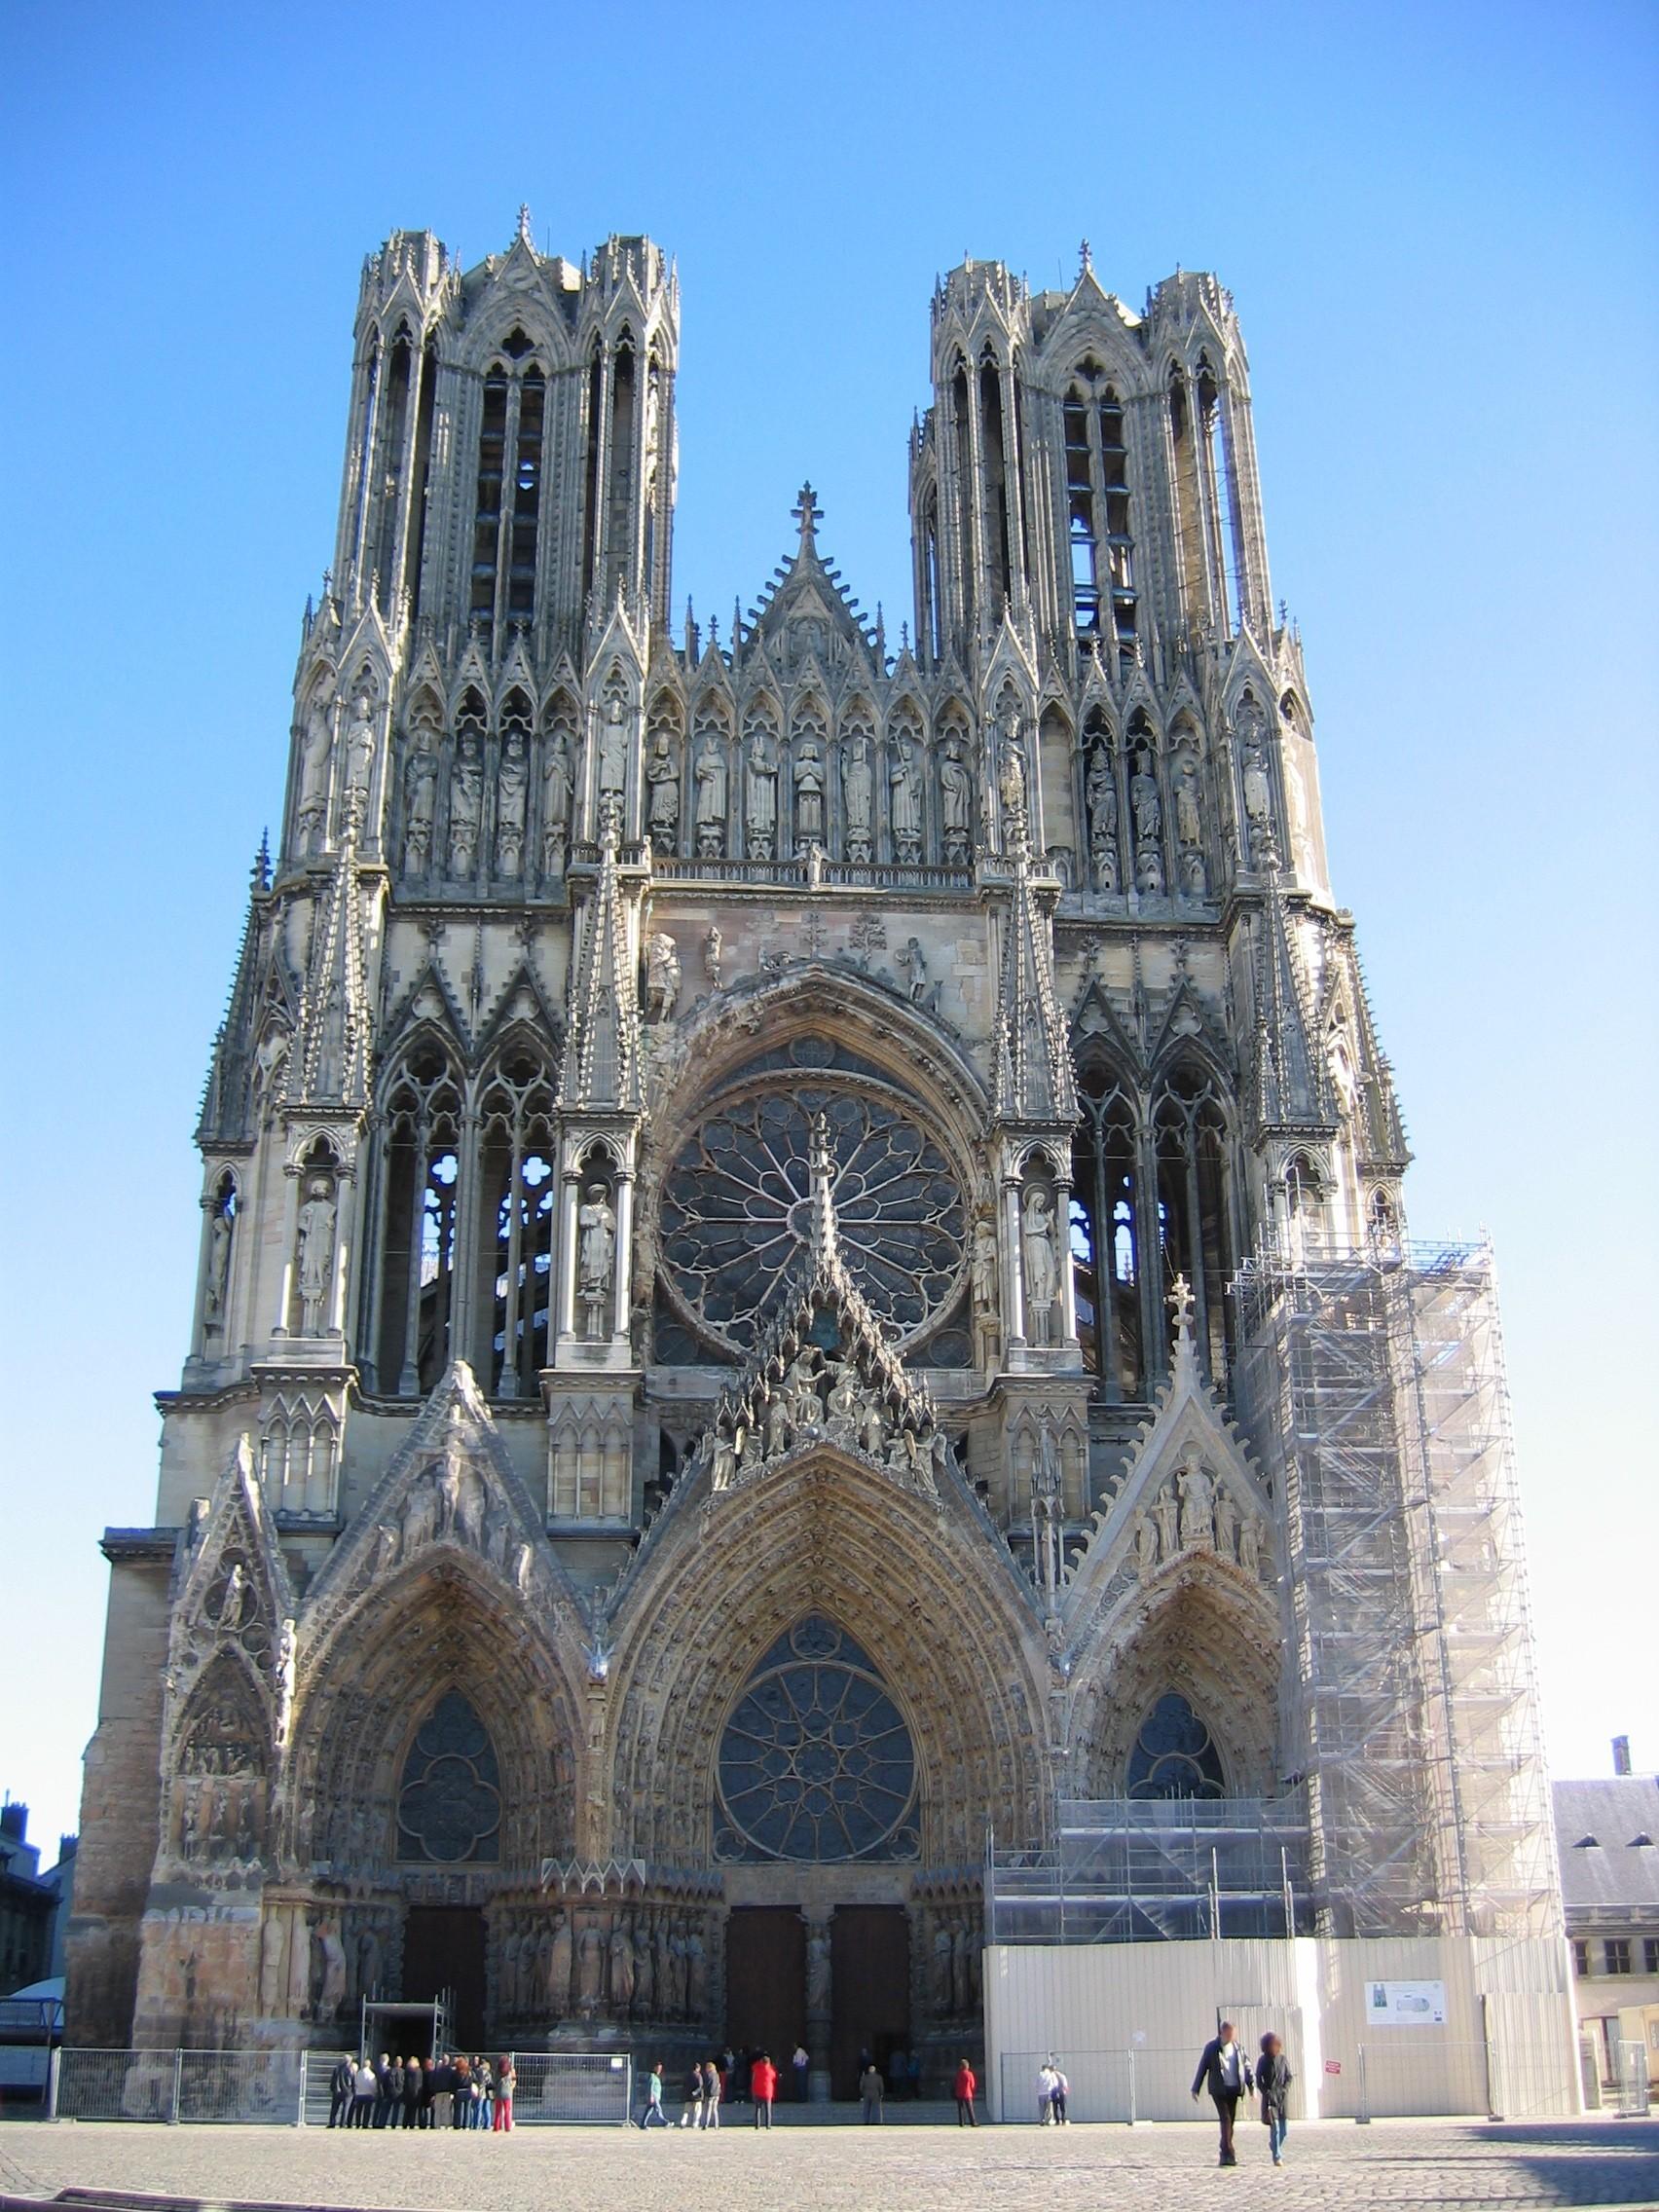 external image Cathedral_Notre-Dame_de_Reims%2C_France.jpg